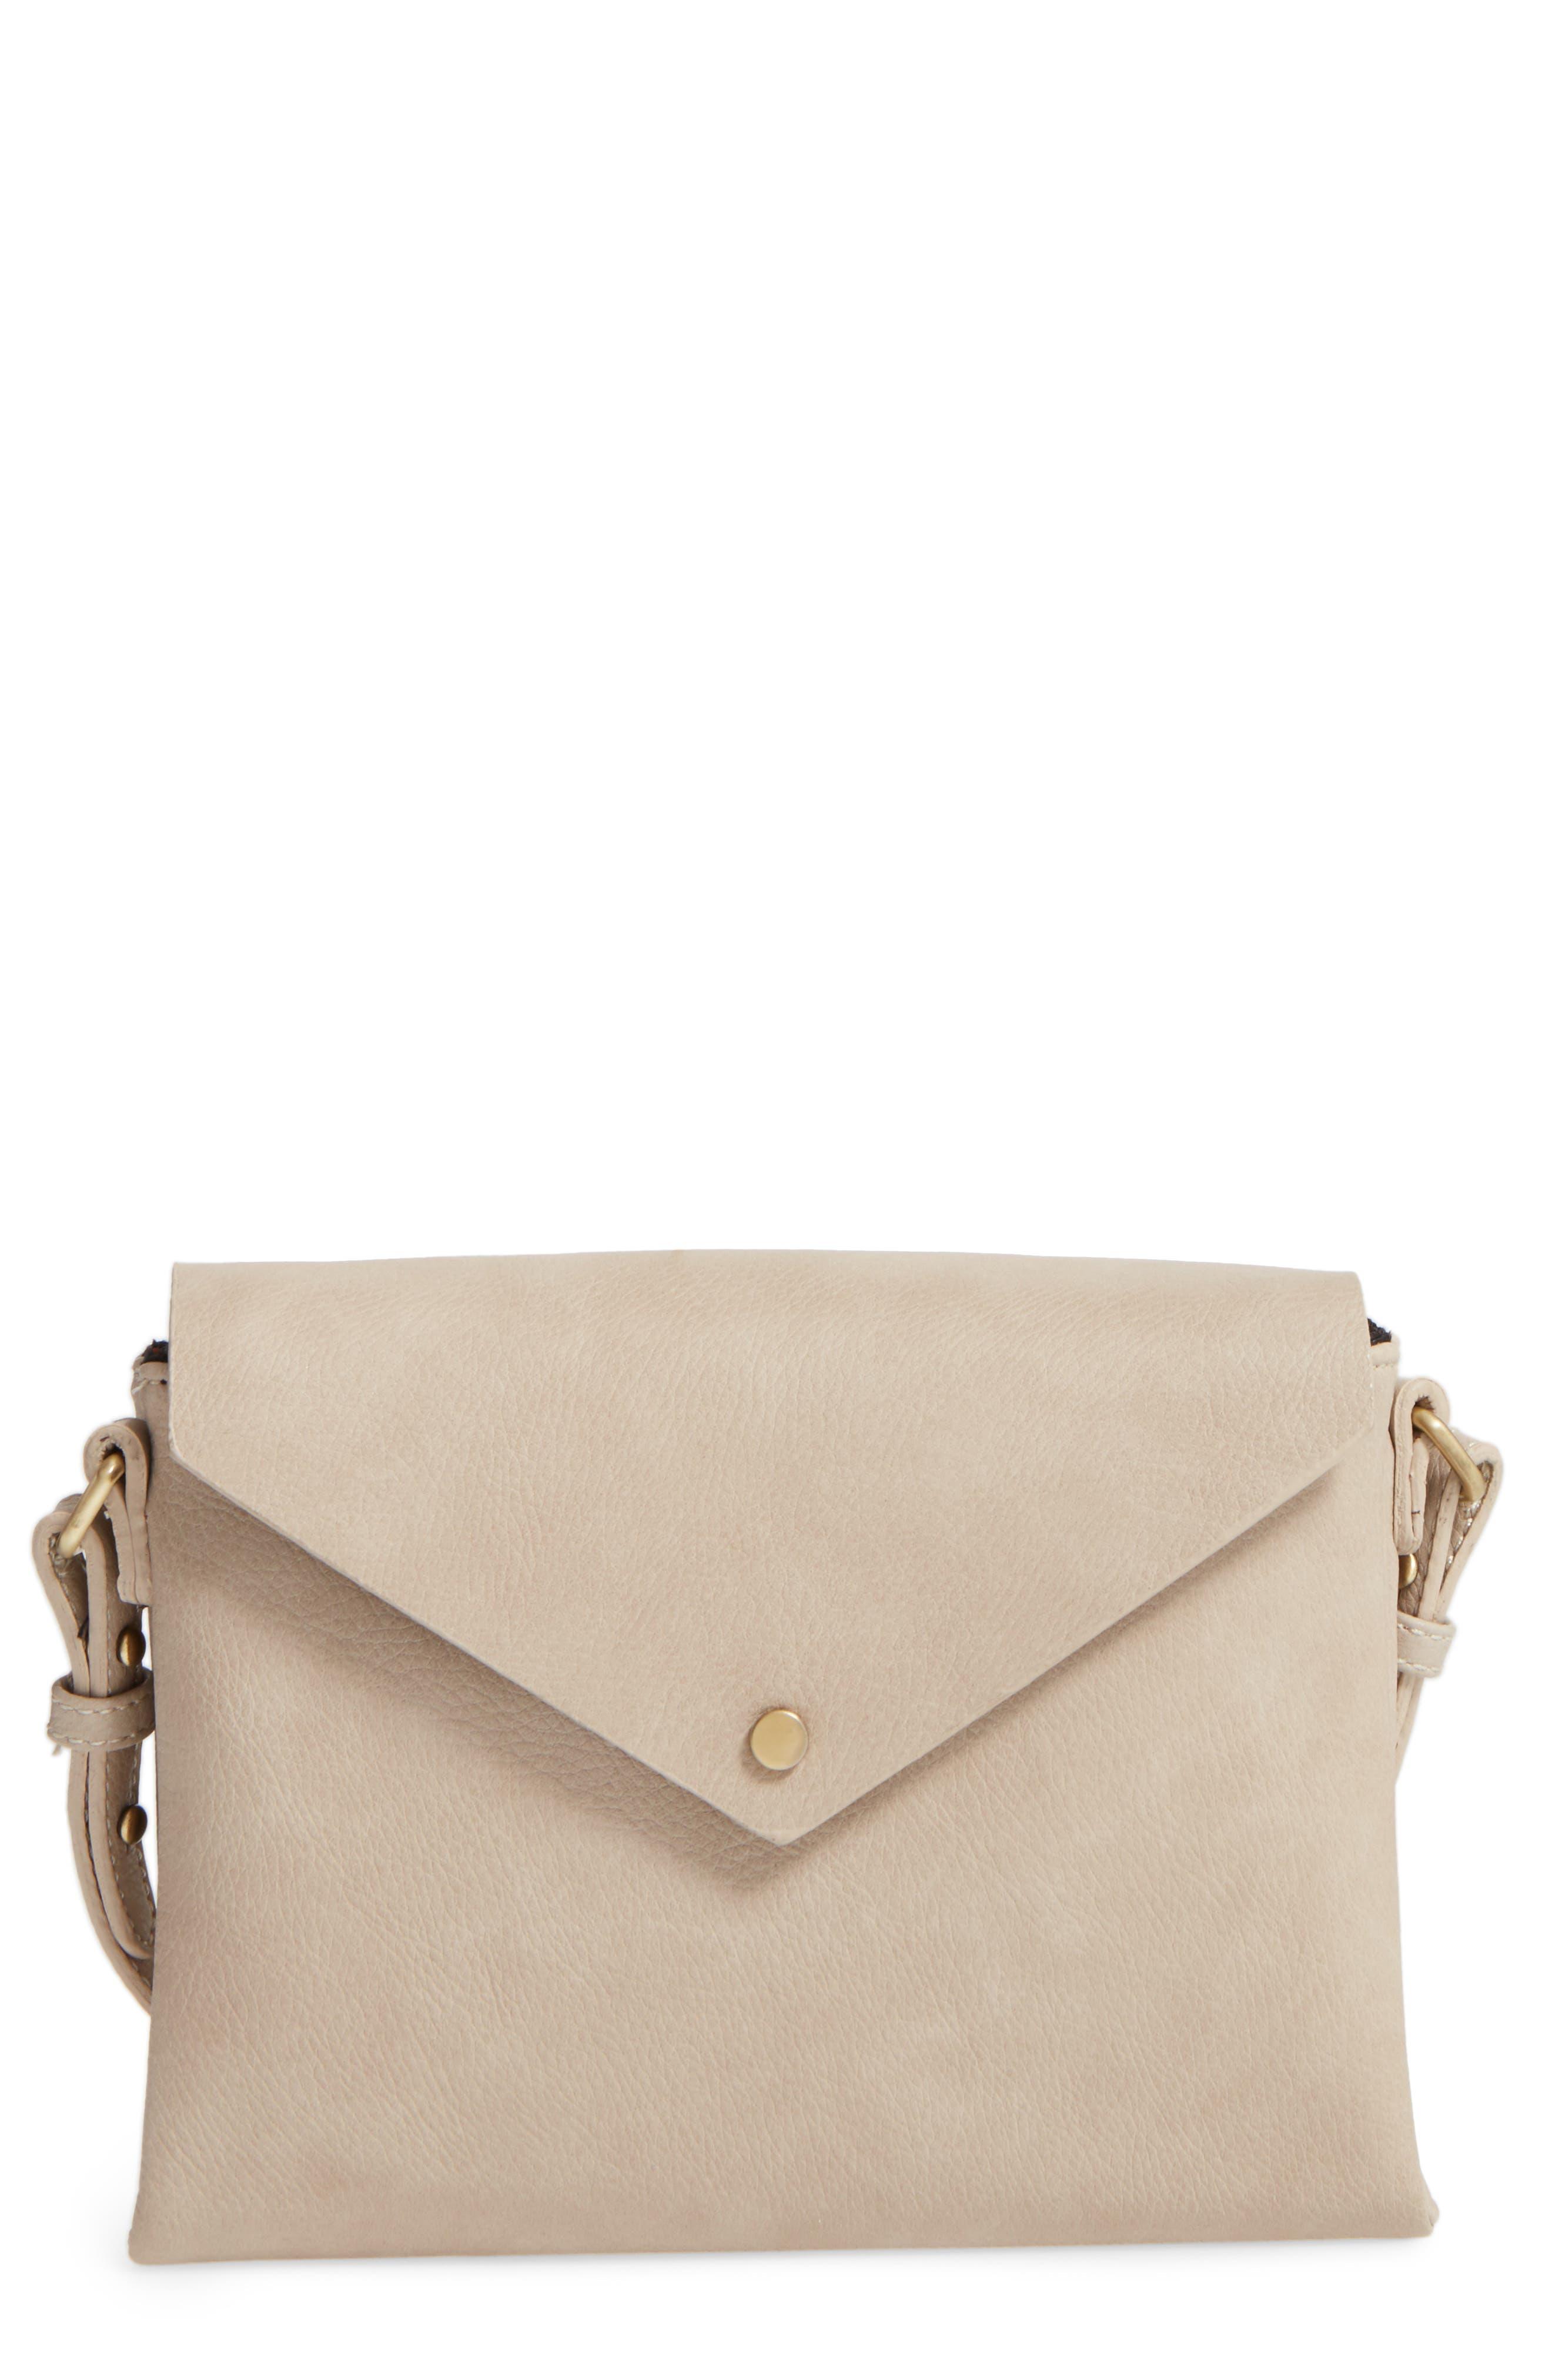 Alternate Image 1 Selected - Street Level Faux Leather Envelope Crossbody Bag